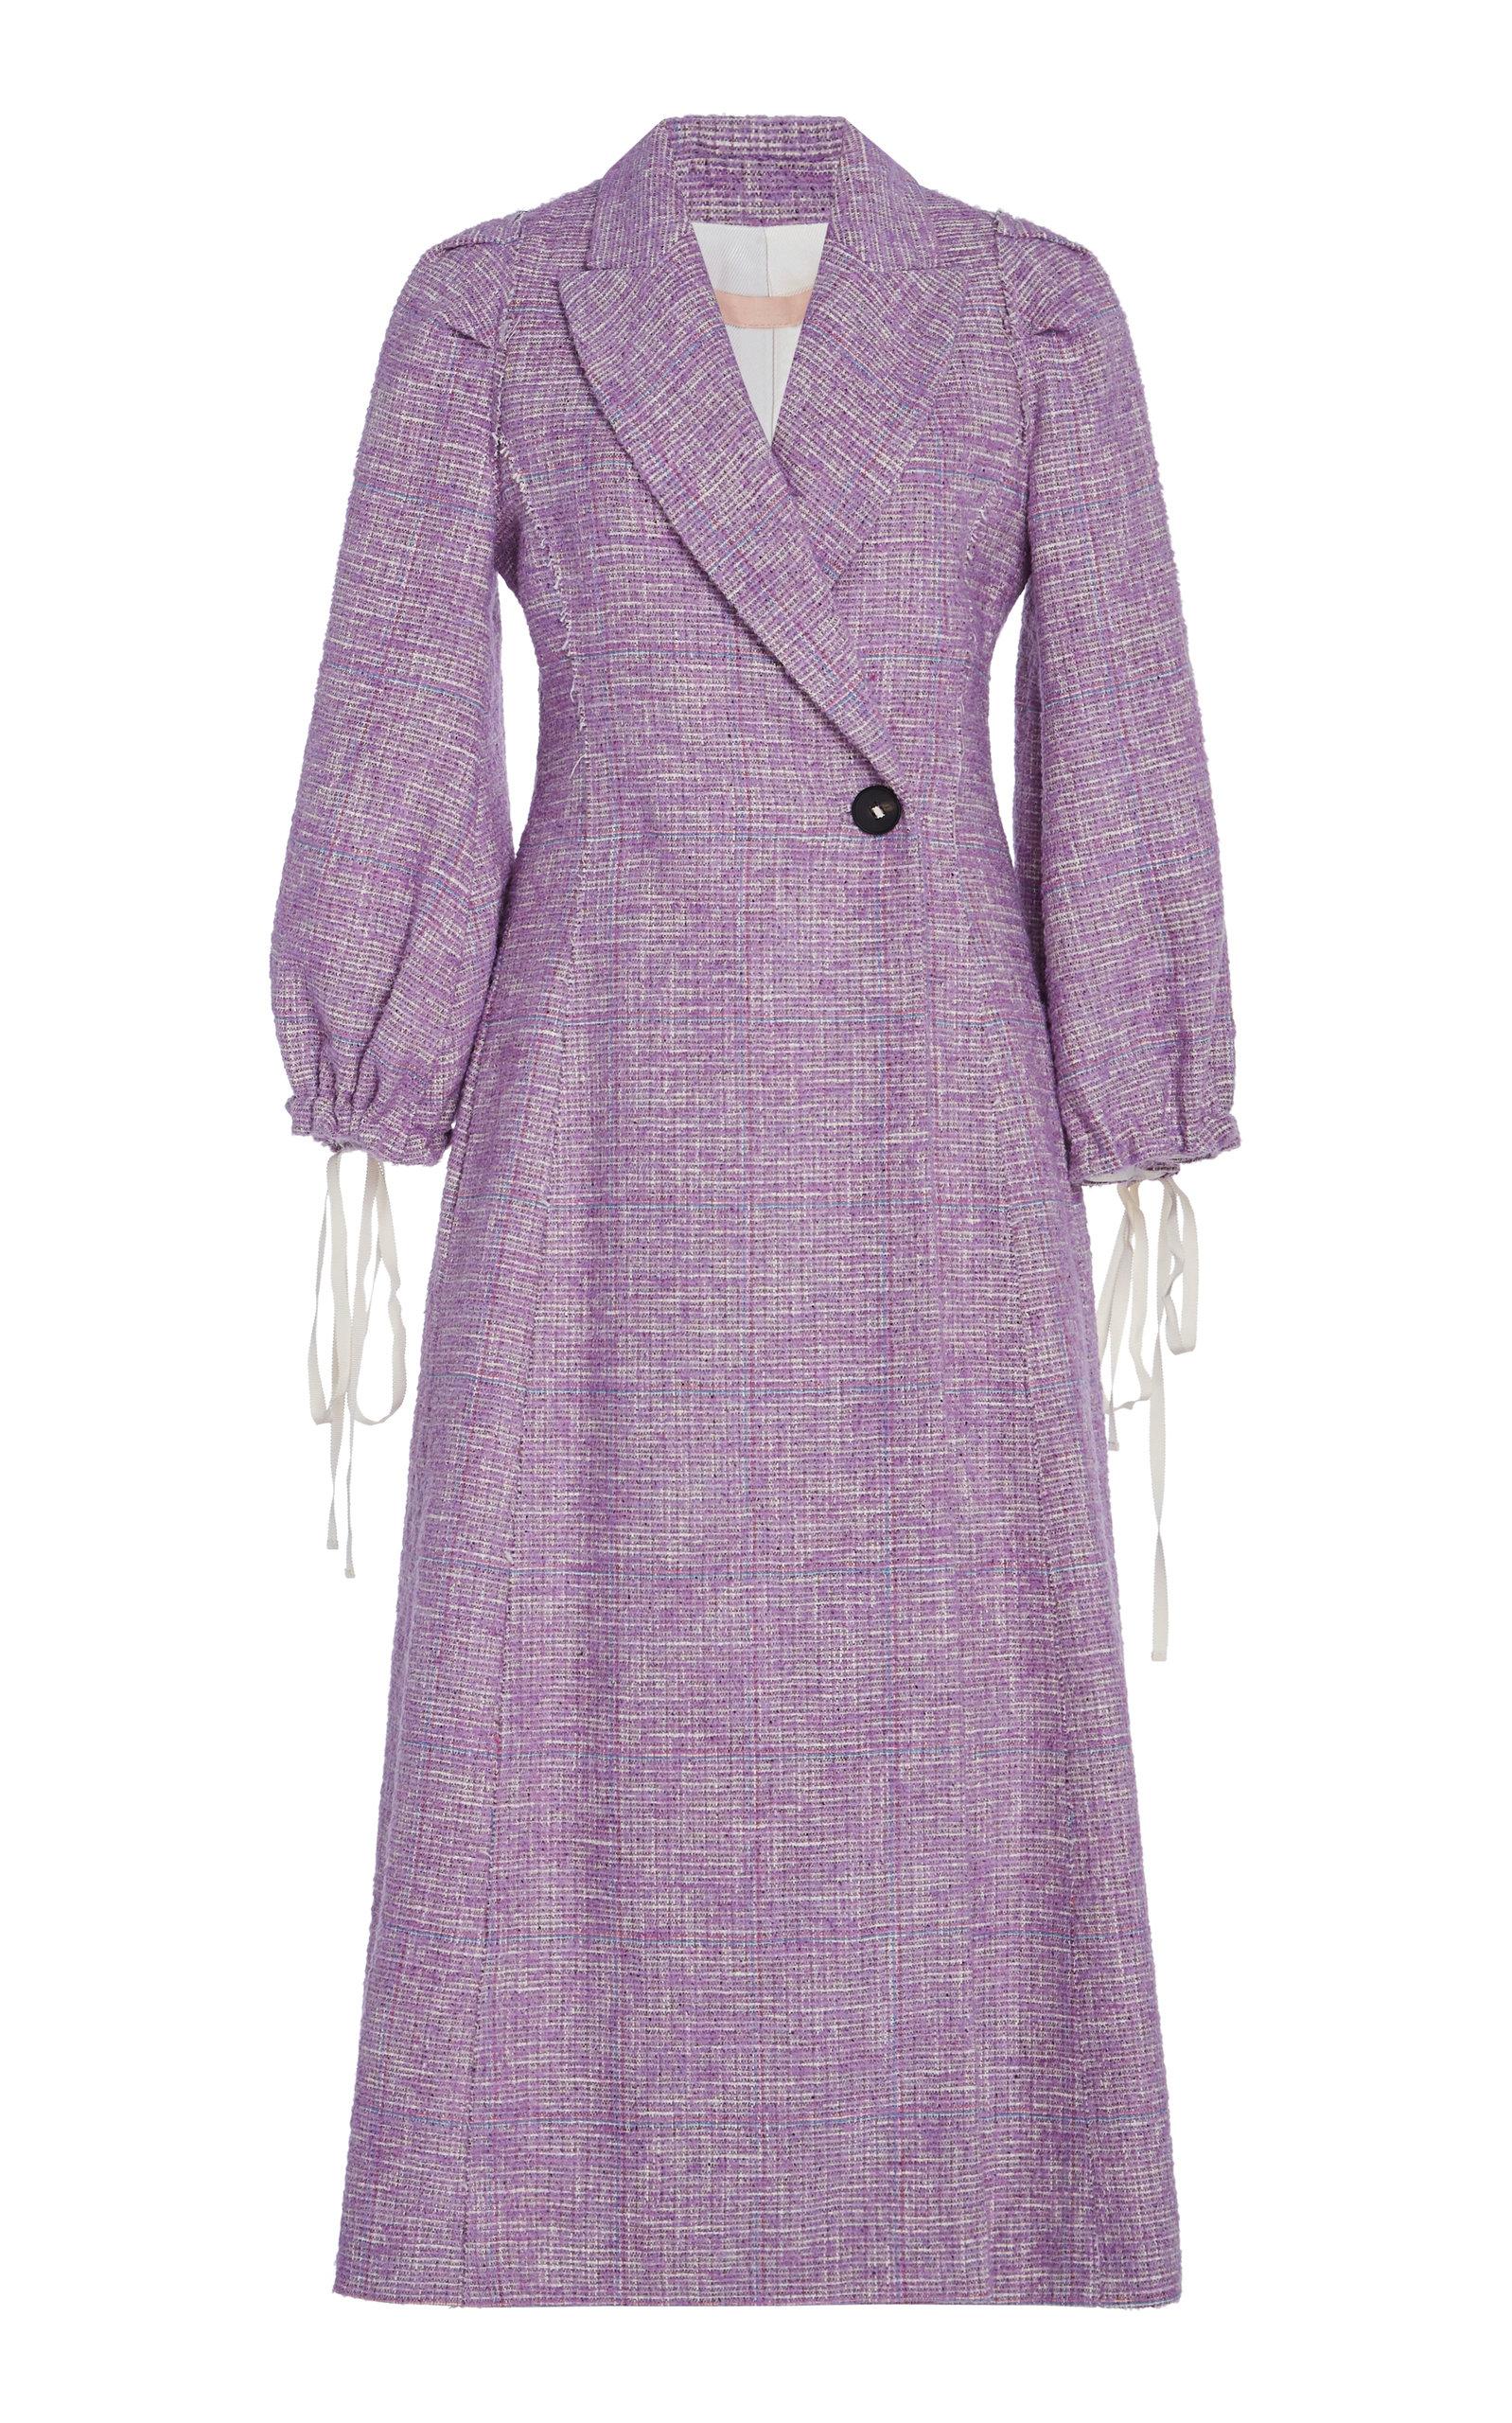 c876f81092a1 Brock Collection Padova Tie-Sleeve Tweed Jacket In Purple